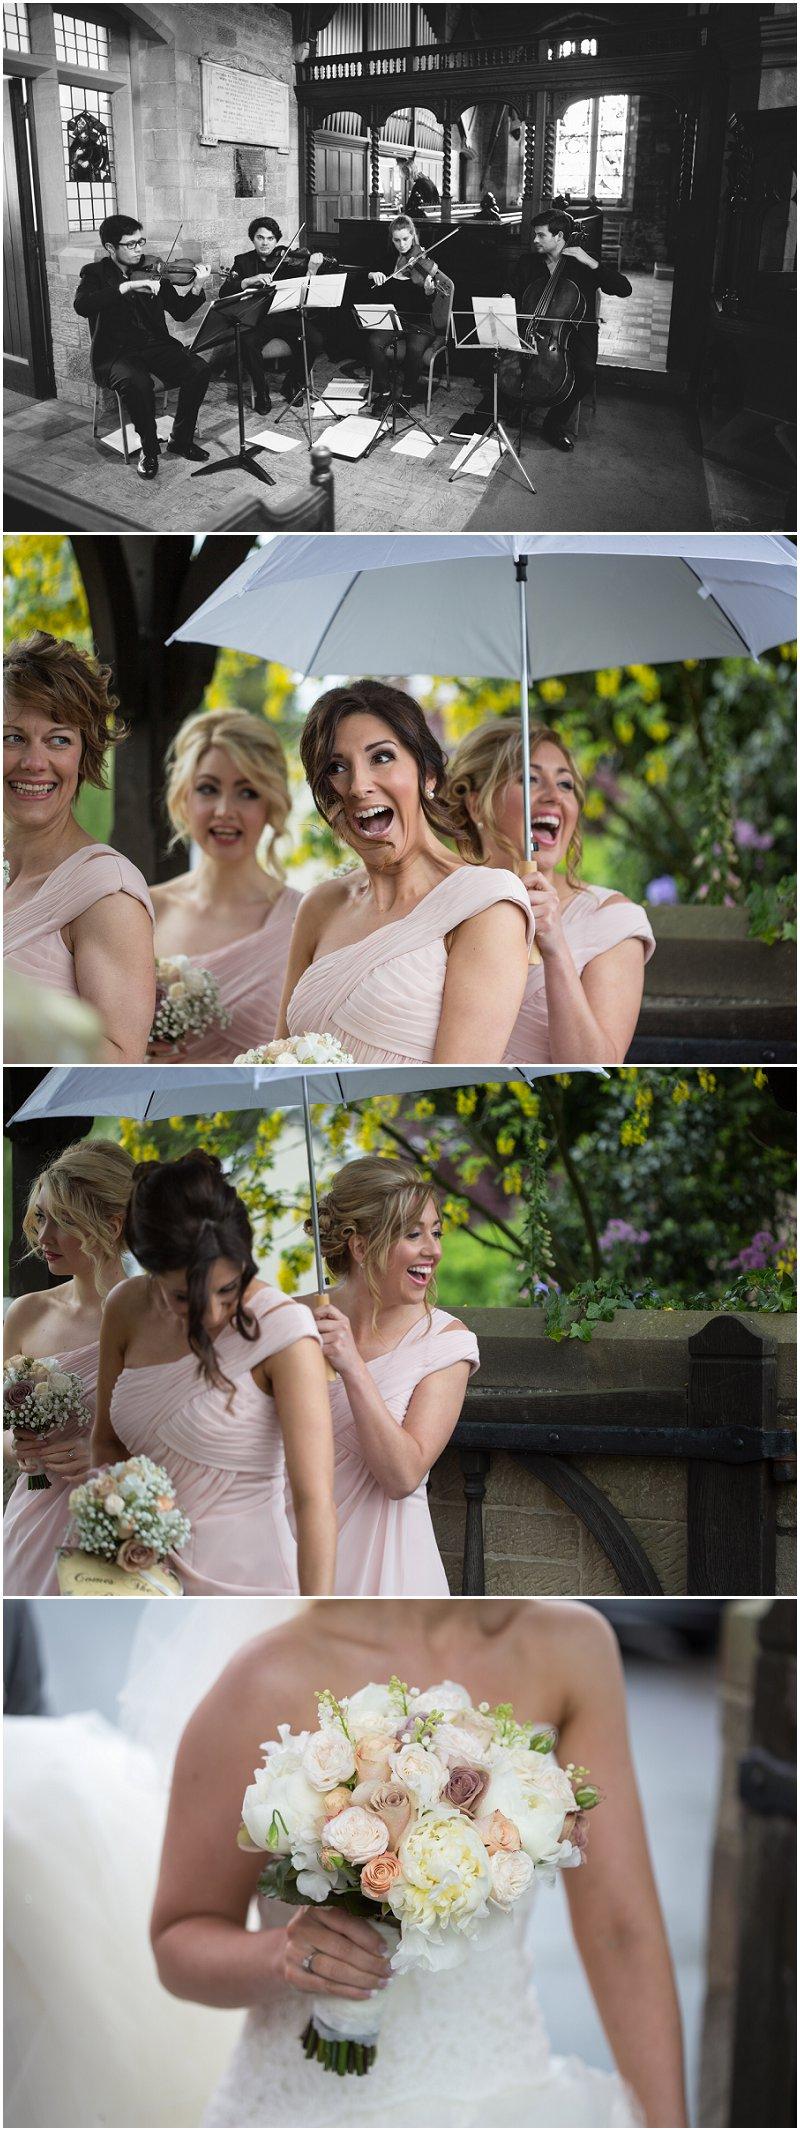 String Quartet and Bridesmaids greet bride at church